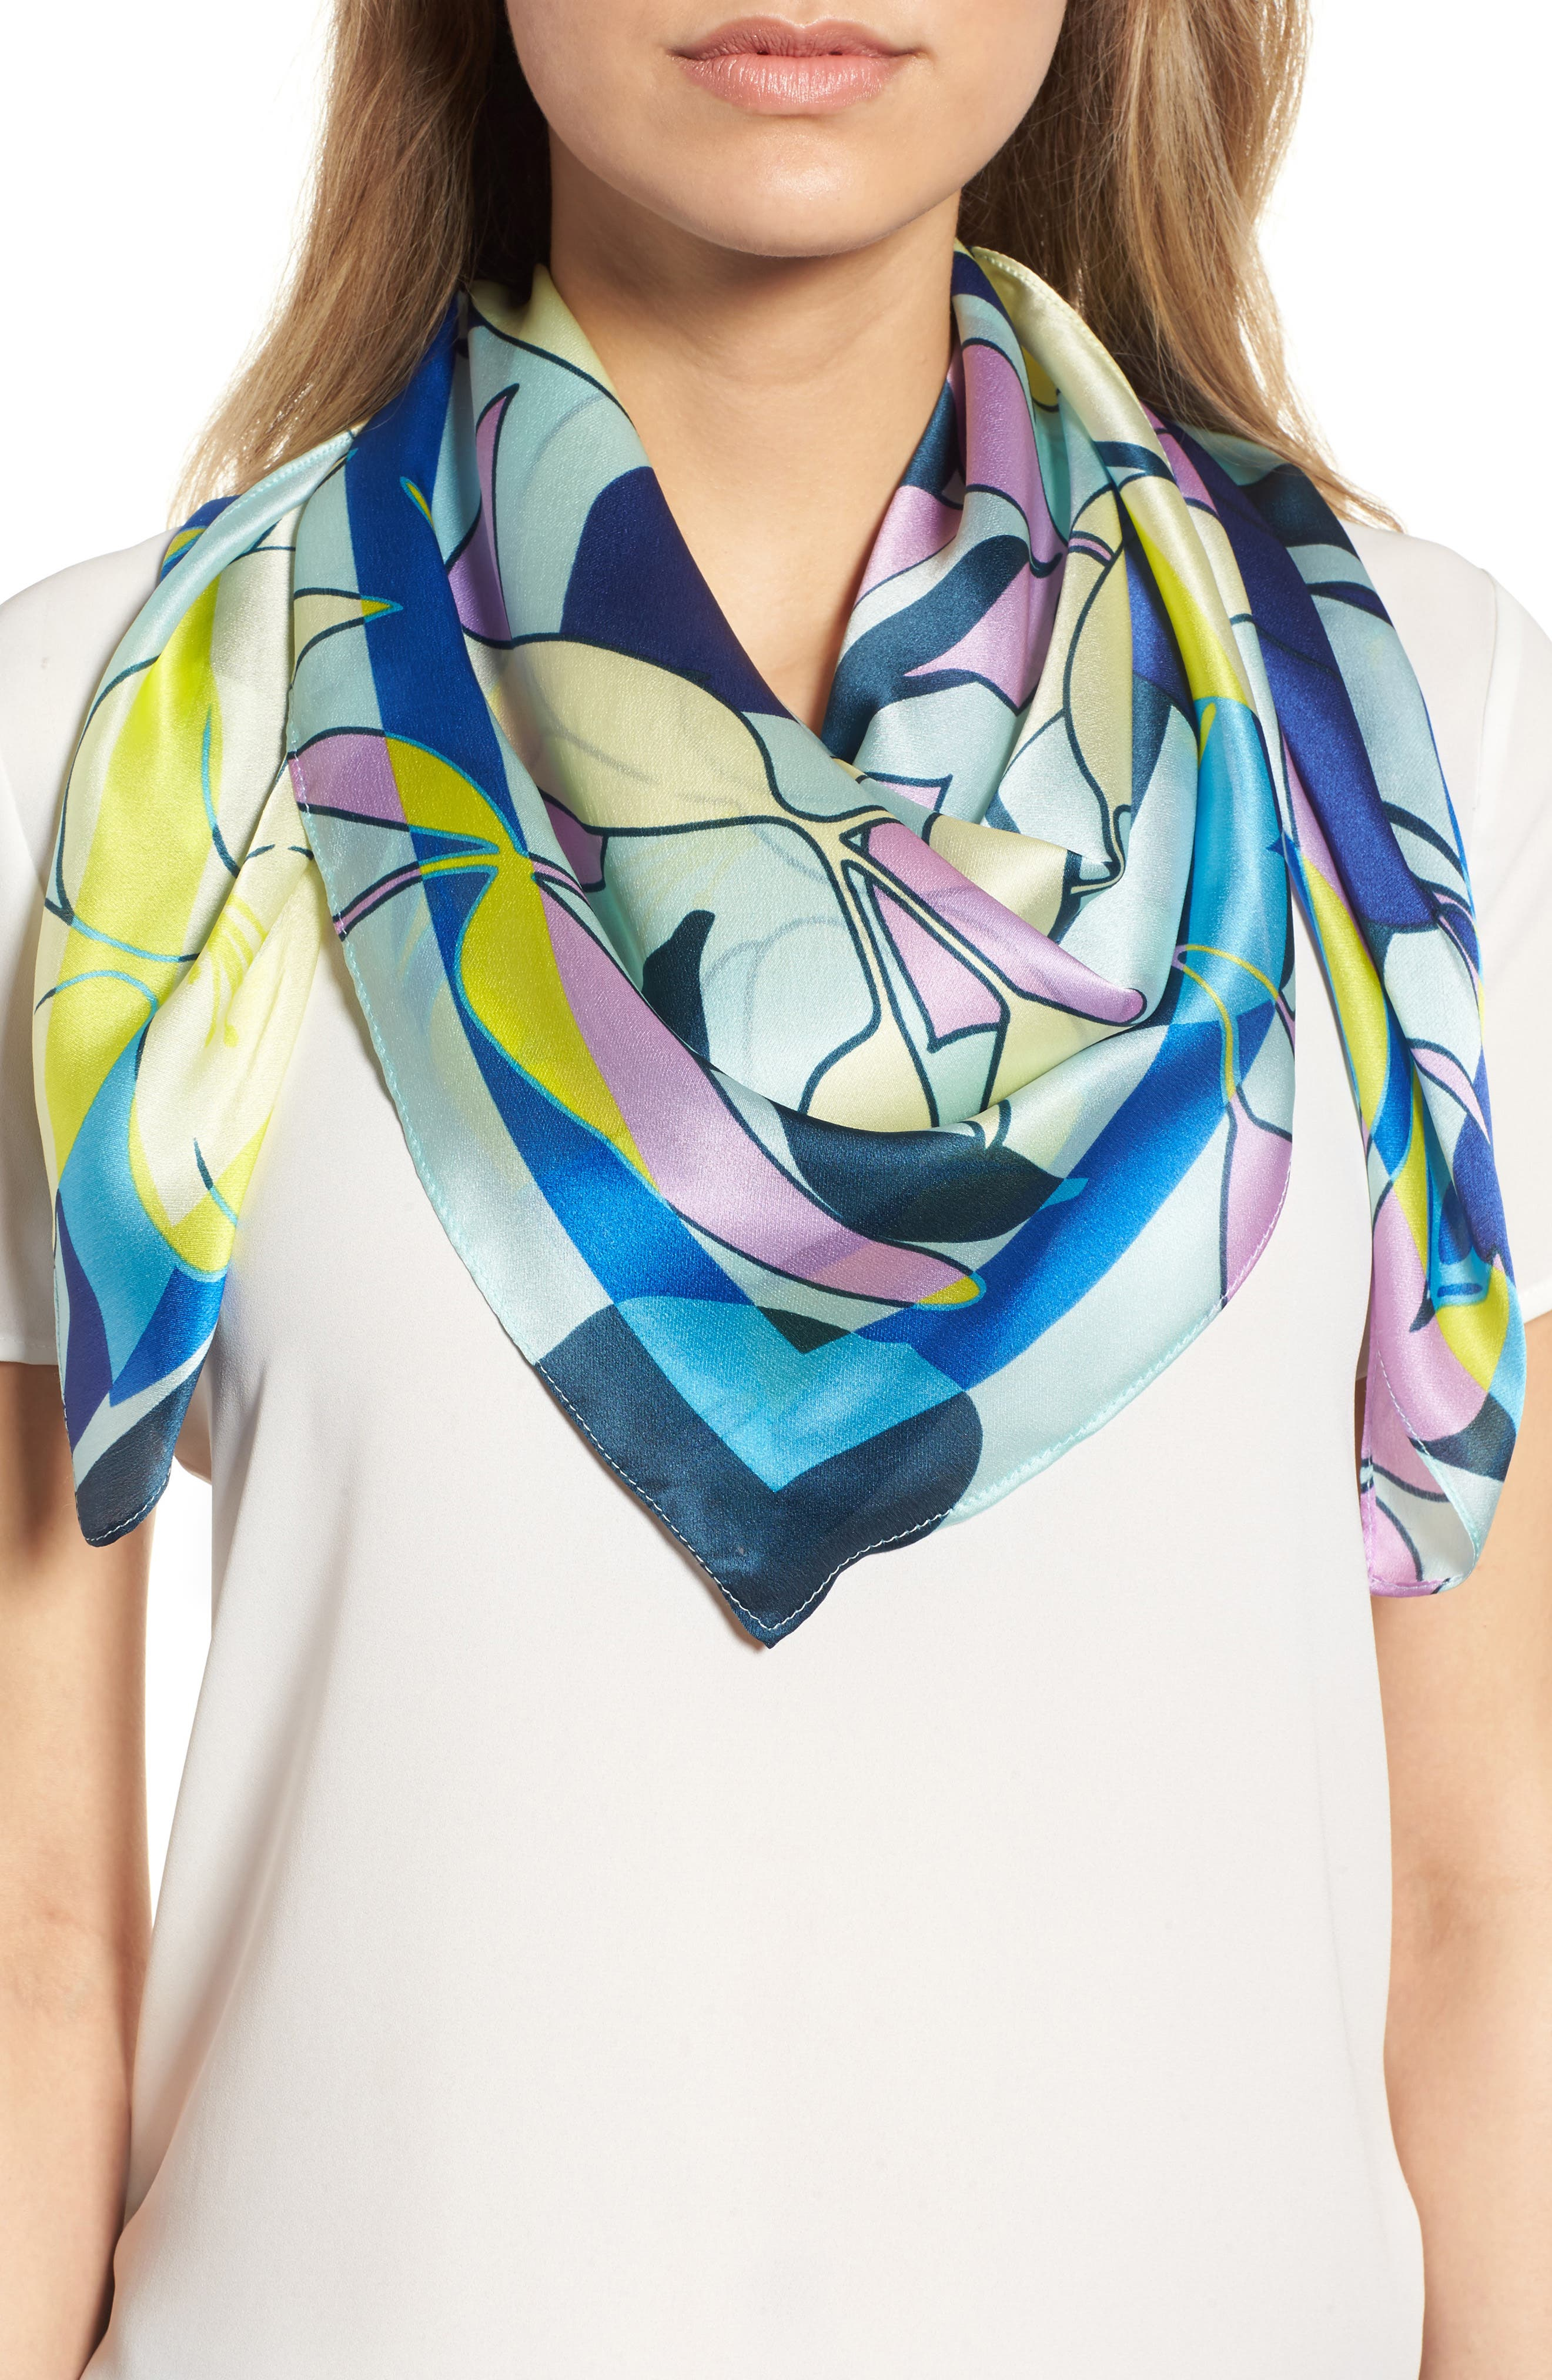 Print Silk Scarf,                             Main thumbnail 1, color,                             Blue Pop Art Floral